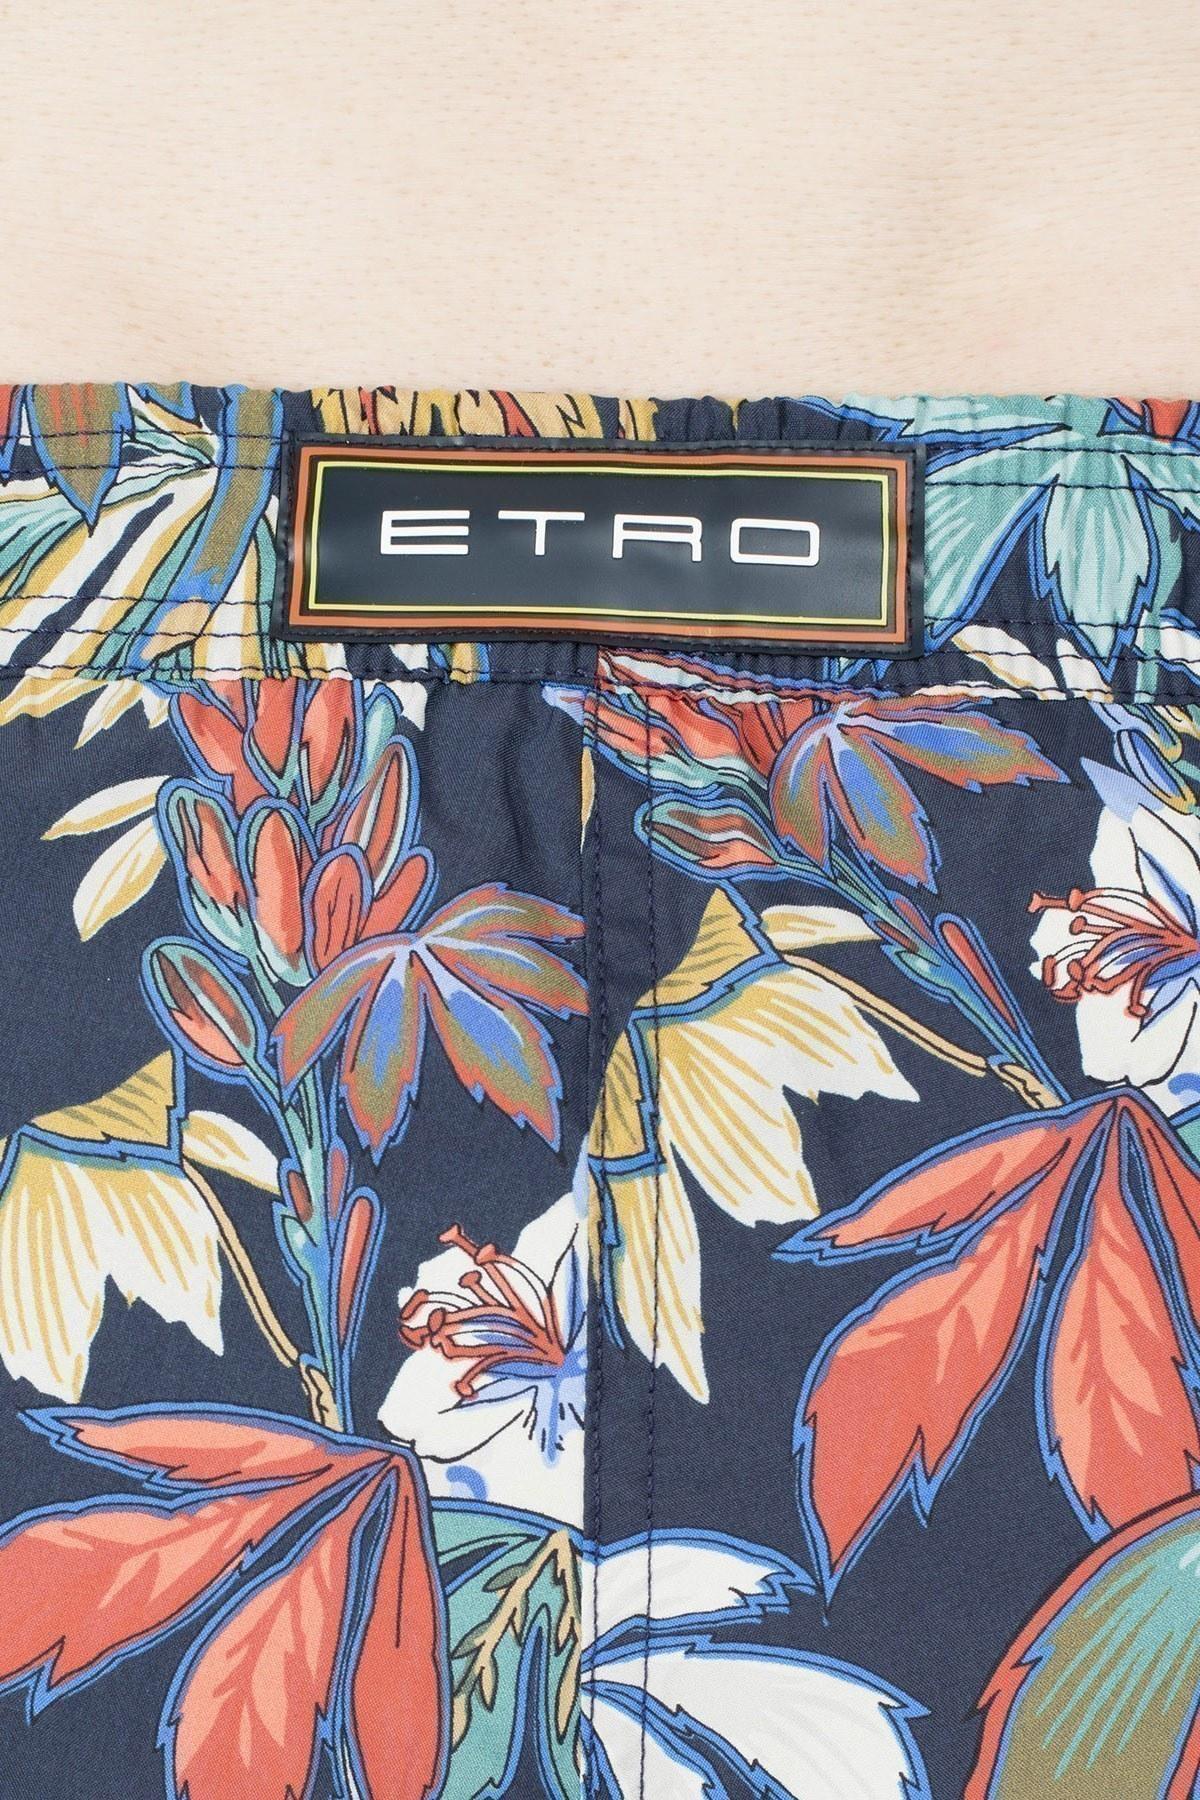 Etro Regular Fit Erkek Mayo Short 1B100 4125 200 LACİVERT